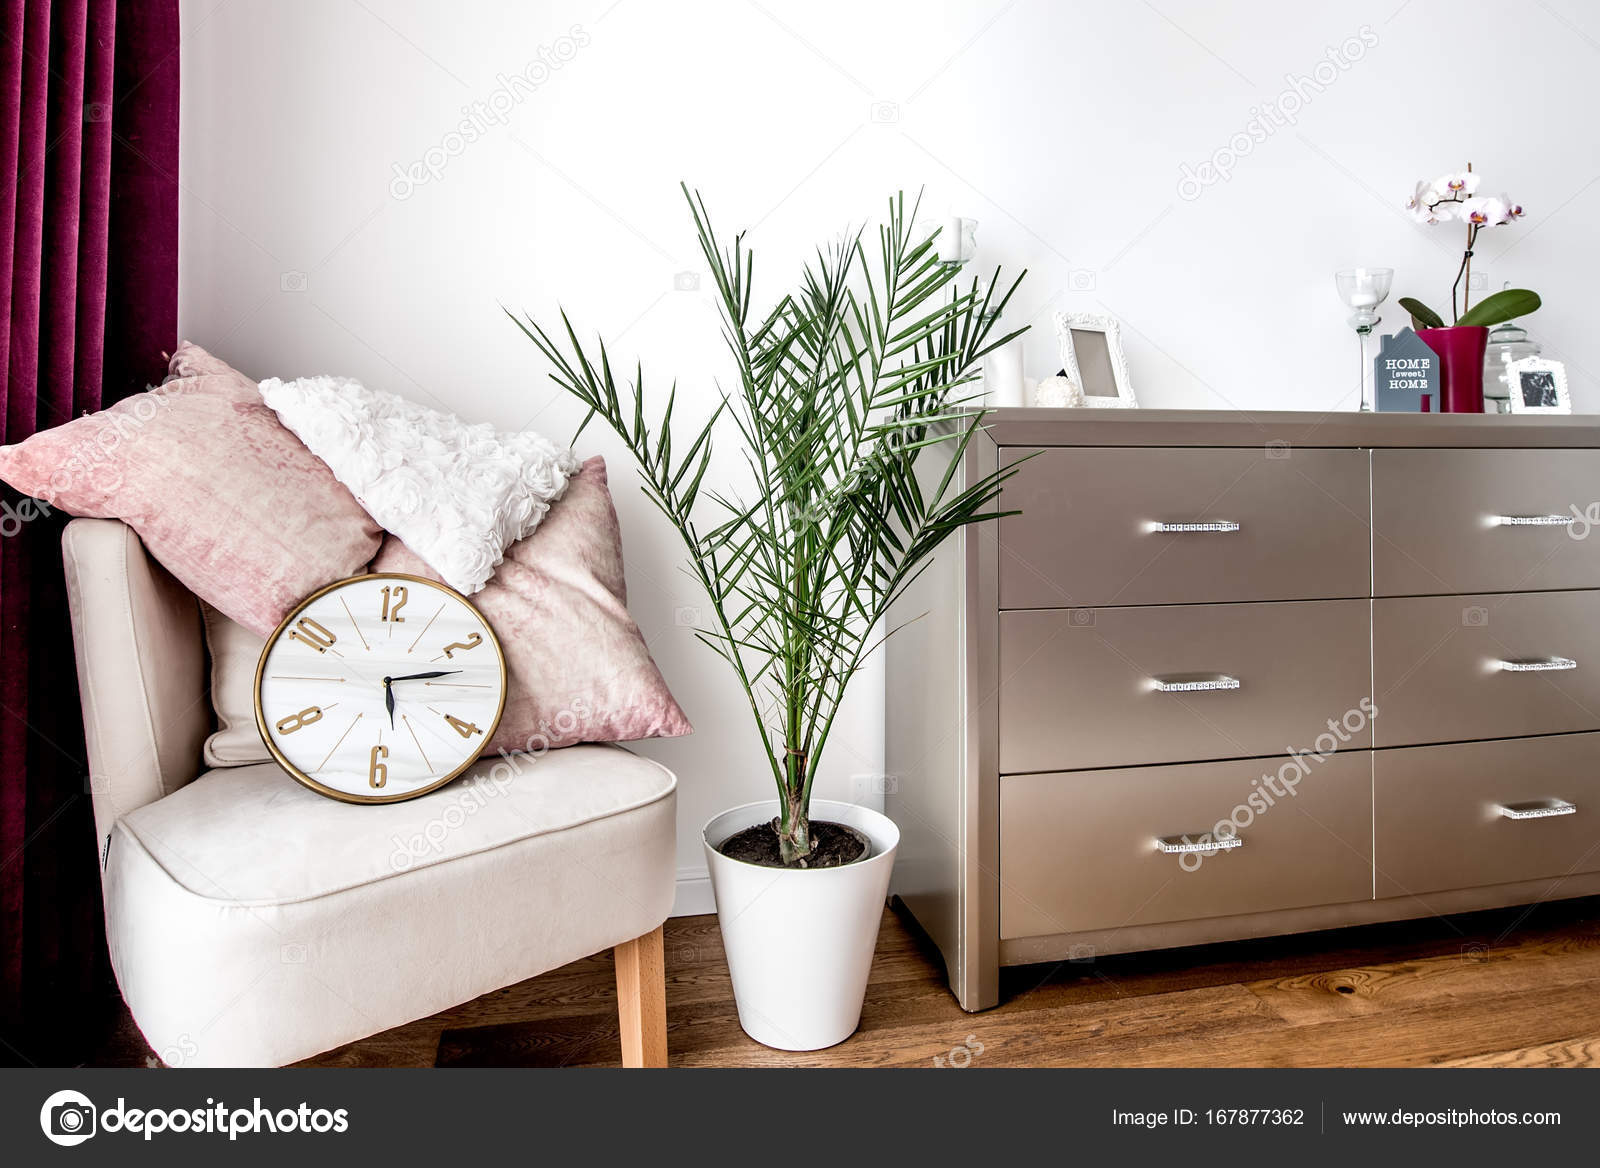 Design Slaapkamer Meubilair : Stijlvolle hoofdslaapkamer met eigentijds meubilair en design